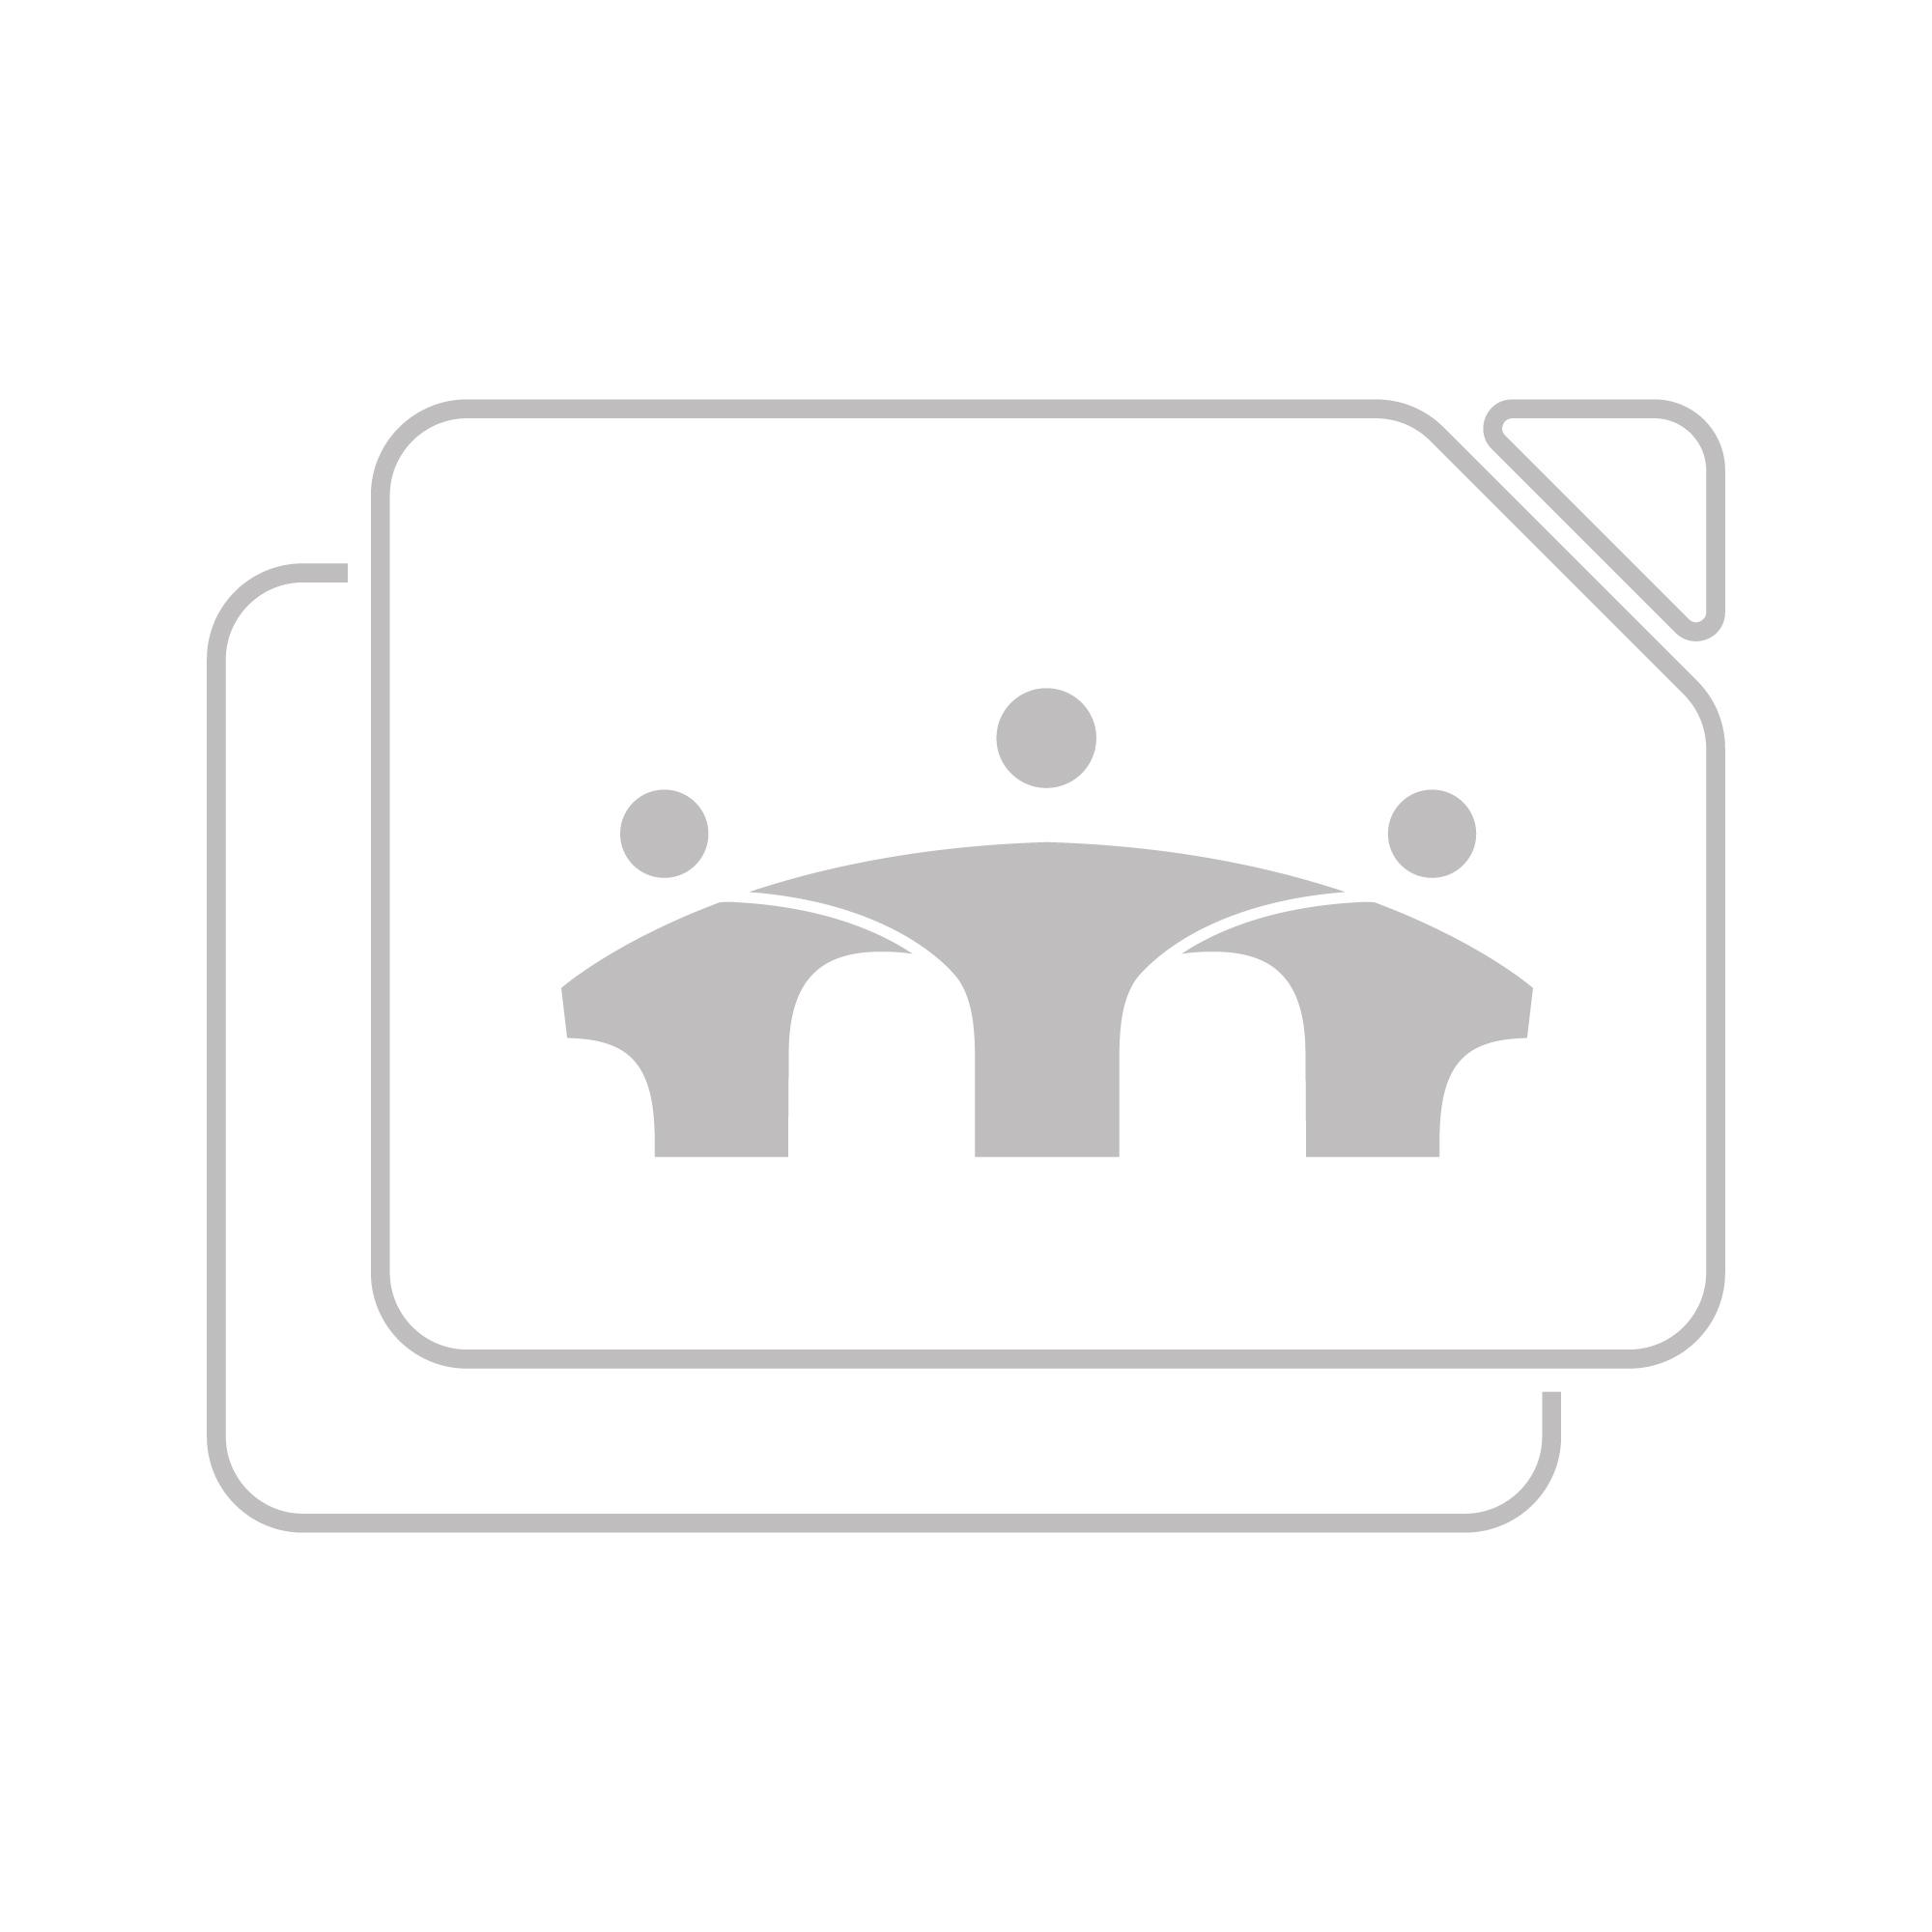 Logitech G915 LIGHTSPEED Wireless RGB Mechanical Gaming Keyboard - GL Tactile - CARBON - UK - INTNL